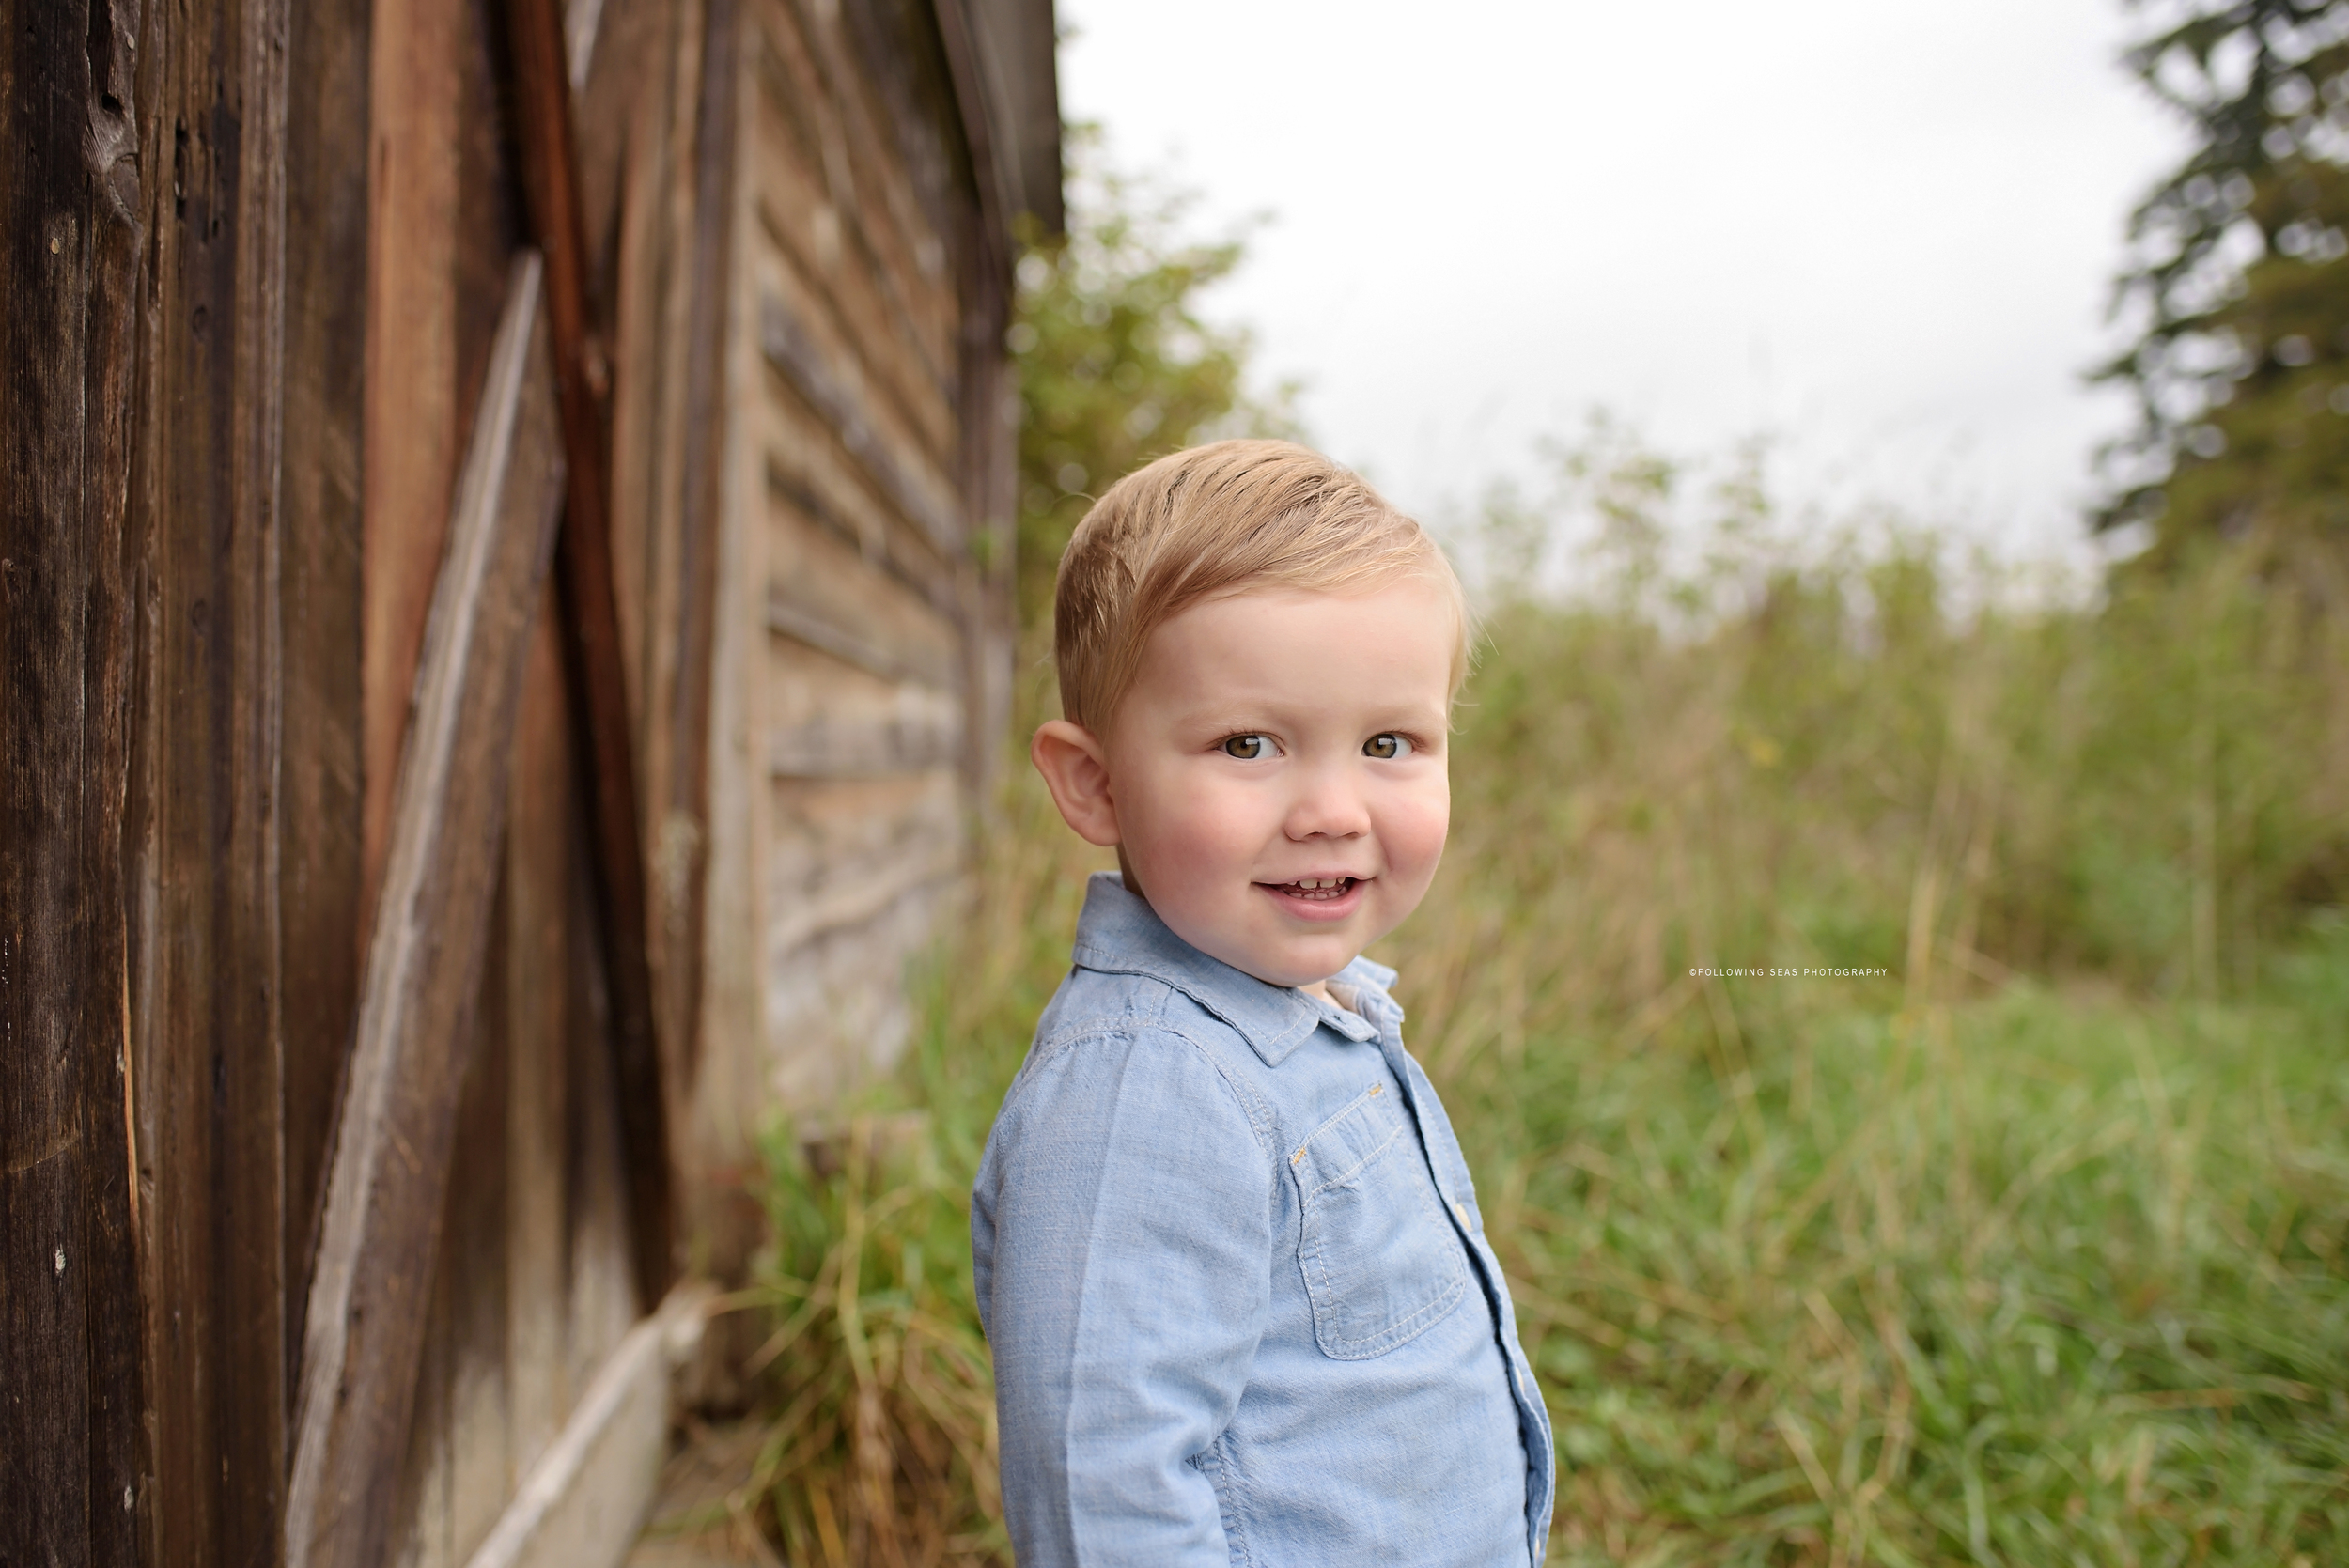 Silverdale-Child-Photographer-Following-Seas-Photography-7923 copy.jpg